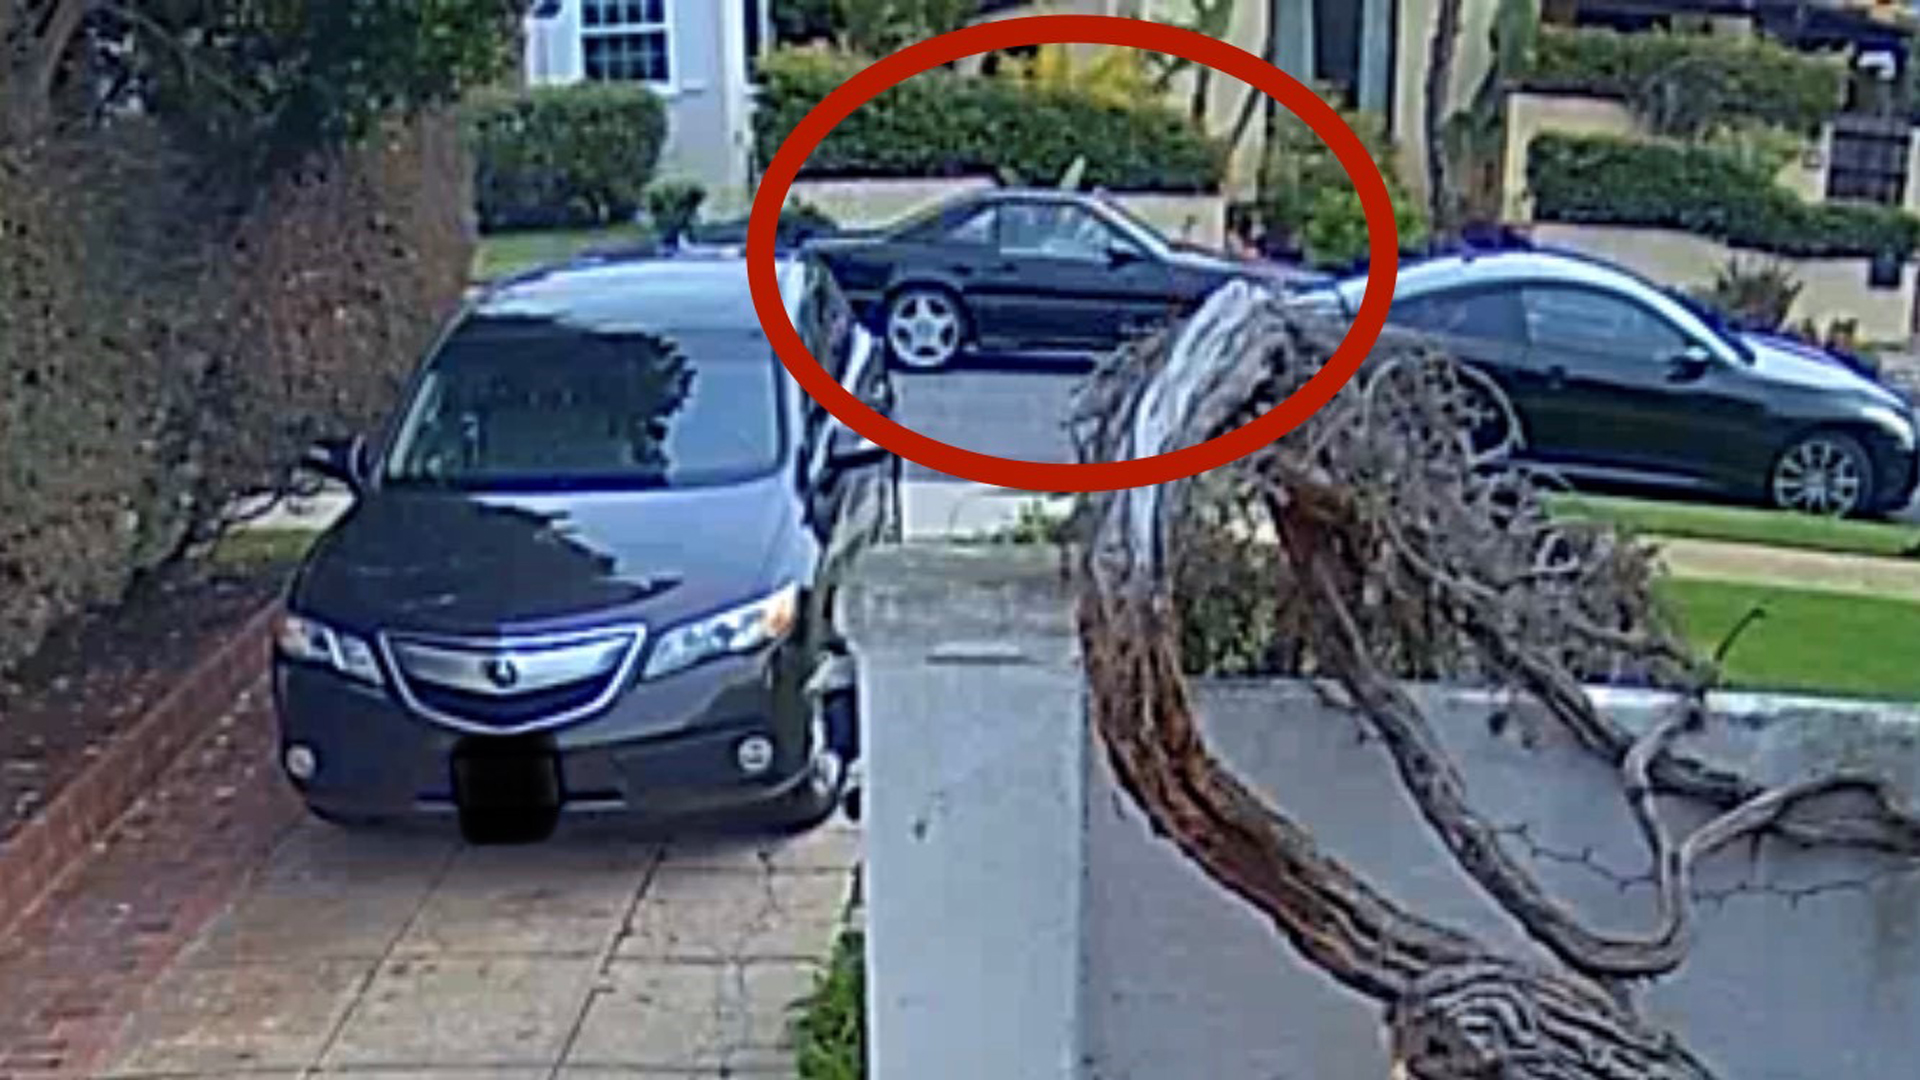 El Segundo police released a photo of the sought car on Dec. 10, 2019.